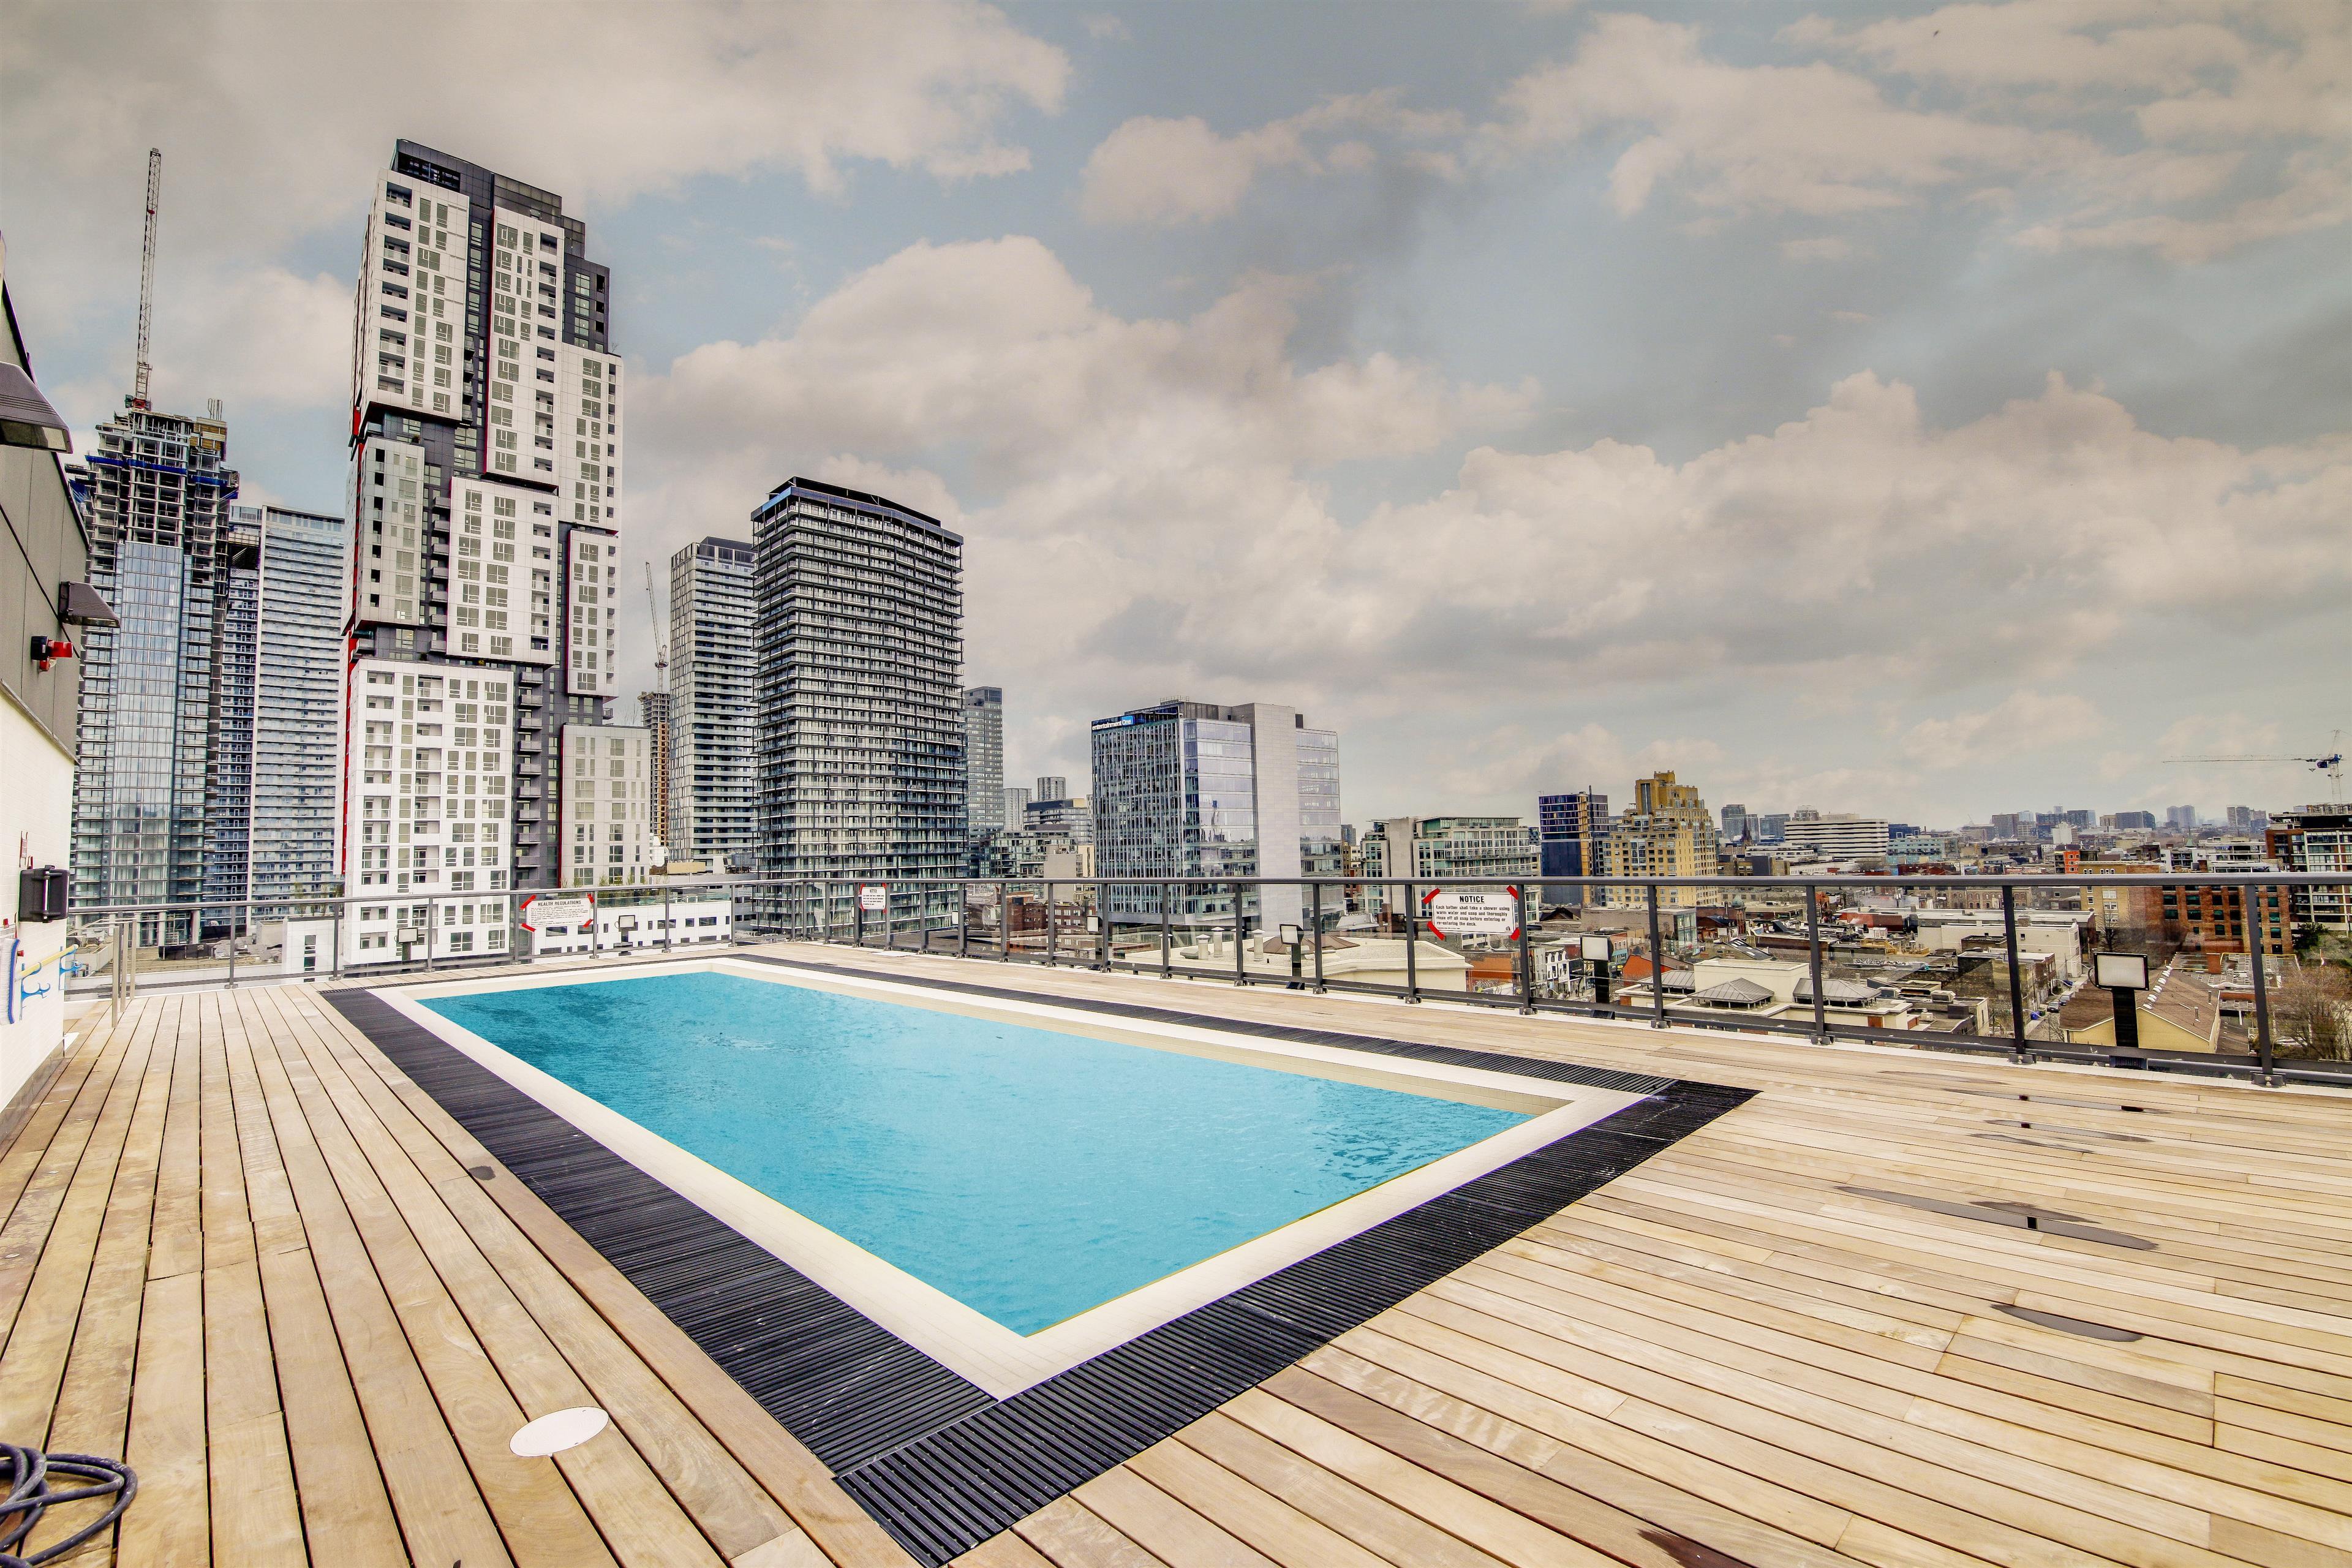 Building_Pool